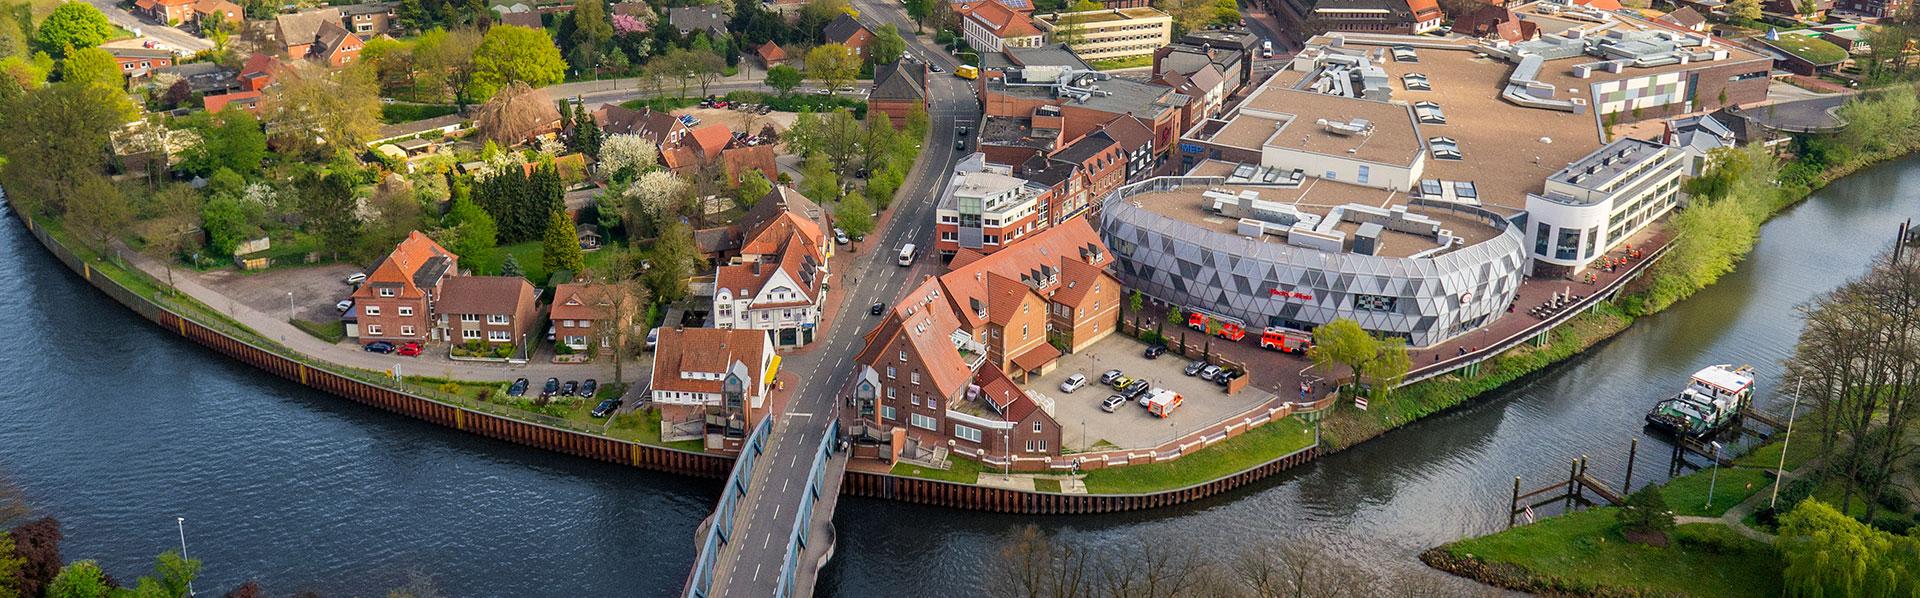 Stadt Meppen Banner 1